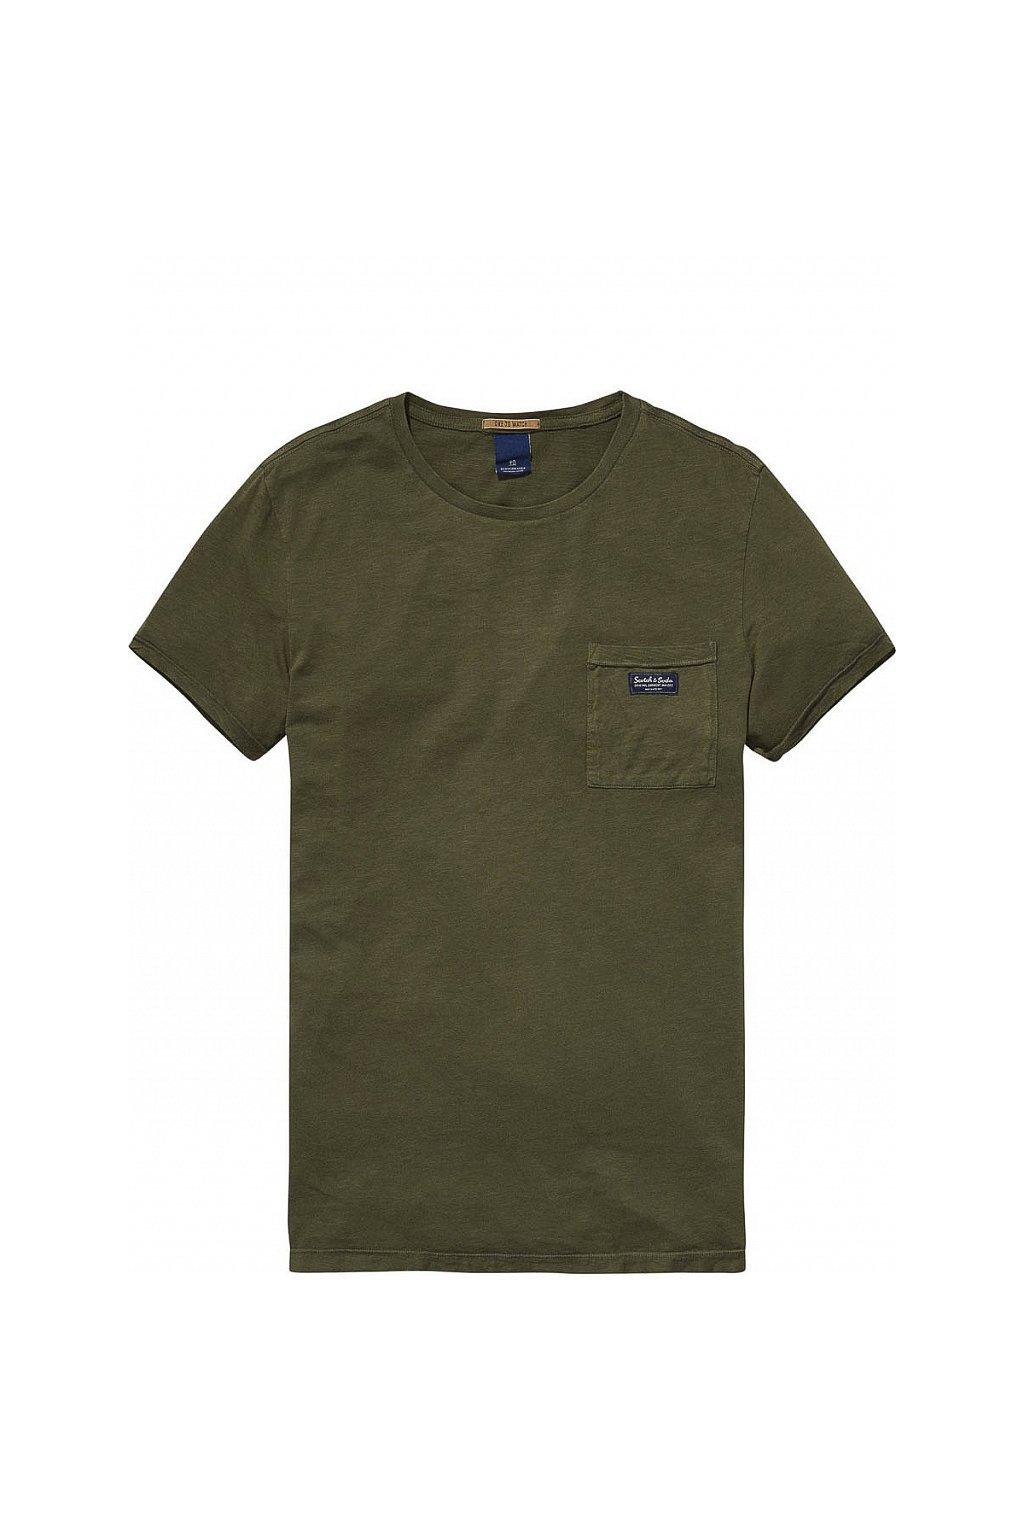 scotchasoda shirt men